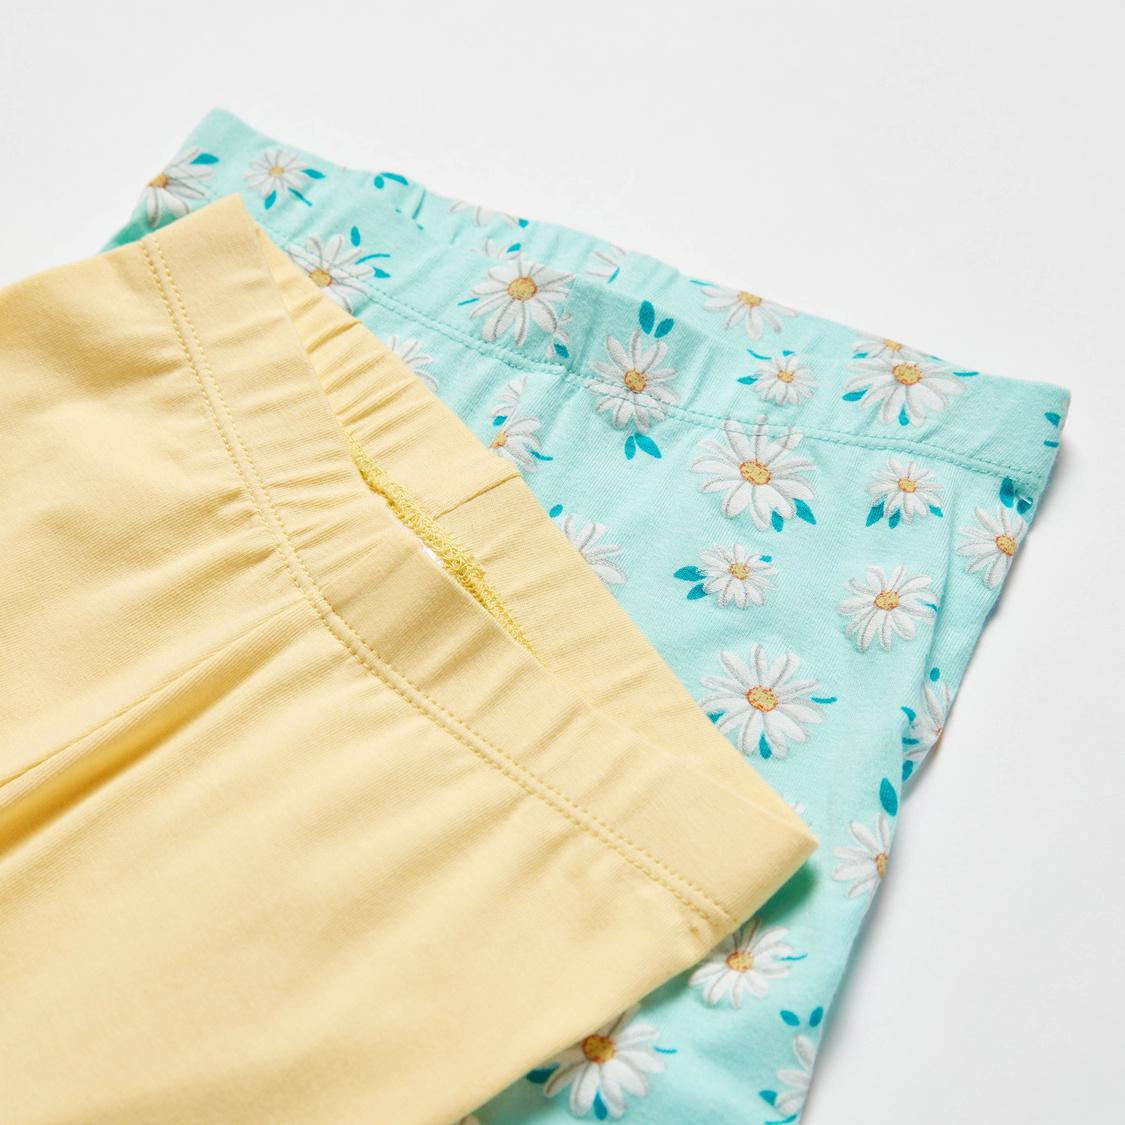 Set of 2 - Printed Full Length Leggings with Elasticised Waistband